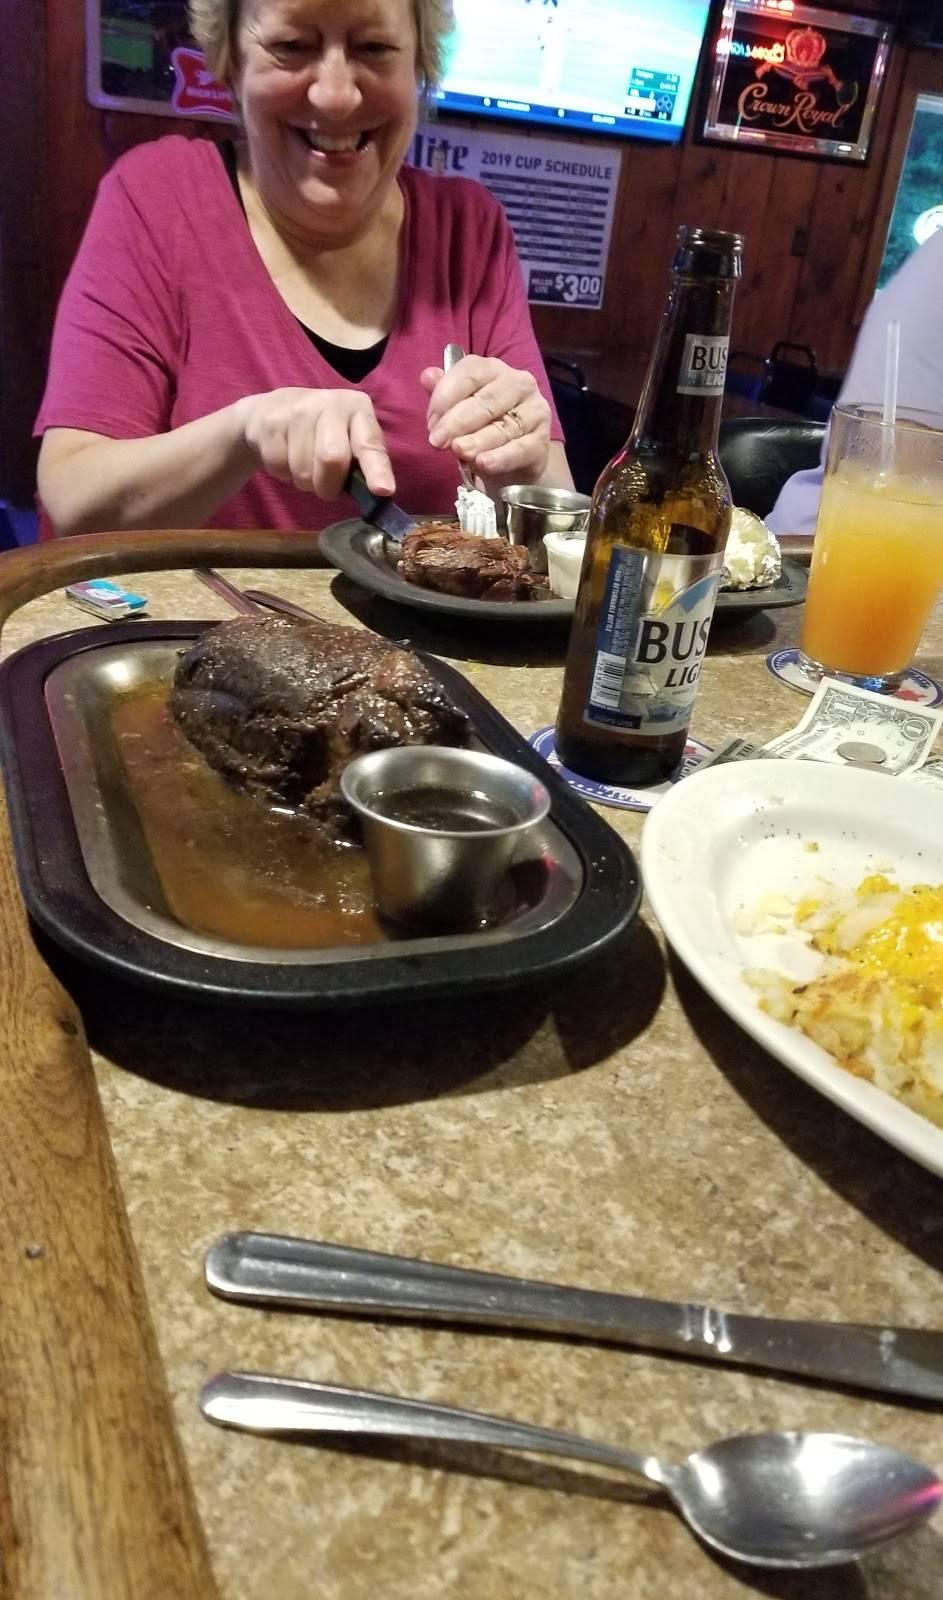 Whippoorwill Hawks Nest - restaurant  | Photo 4 of 10 | Address: 7914 WI-19, Dane, WI 53529, USA | Phone: (608) 798-9991